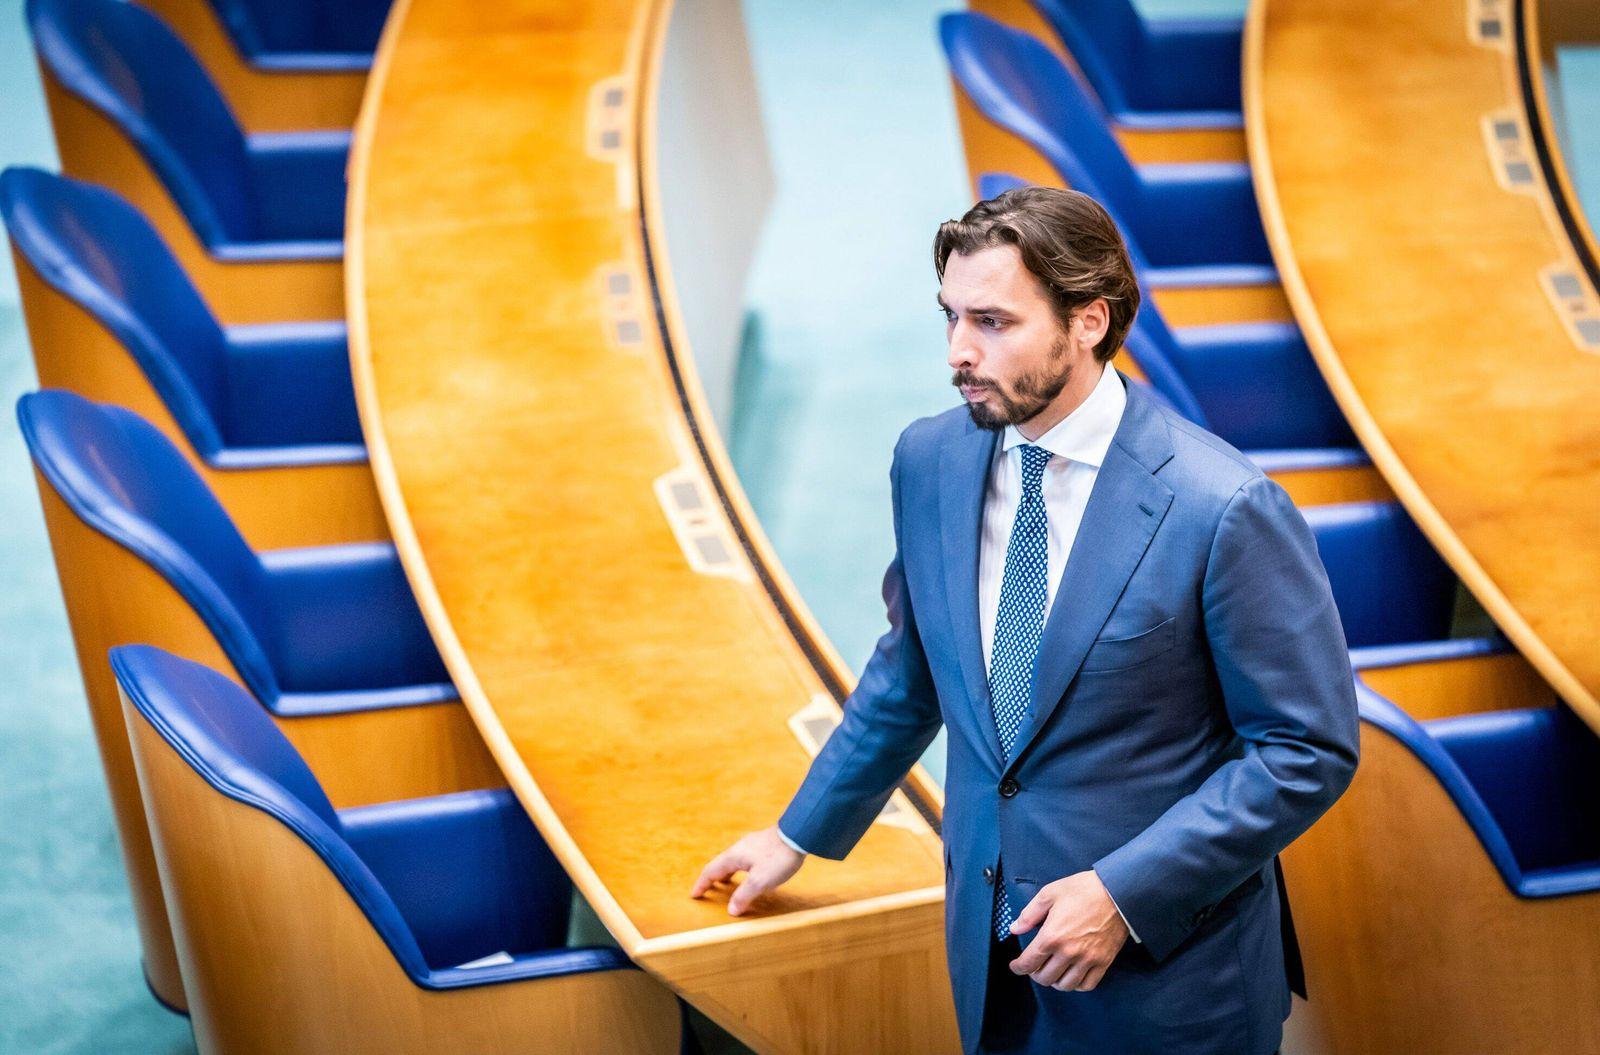 DEN HAAG,15-09-2020, Minister van Financien Wopke Hoekstra hands the Miljoenennota to the Dutch Parliament at Prinsjesda